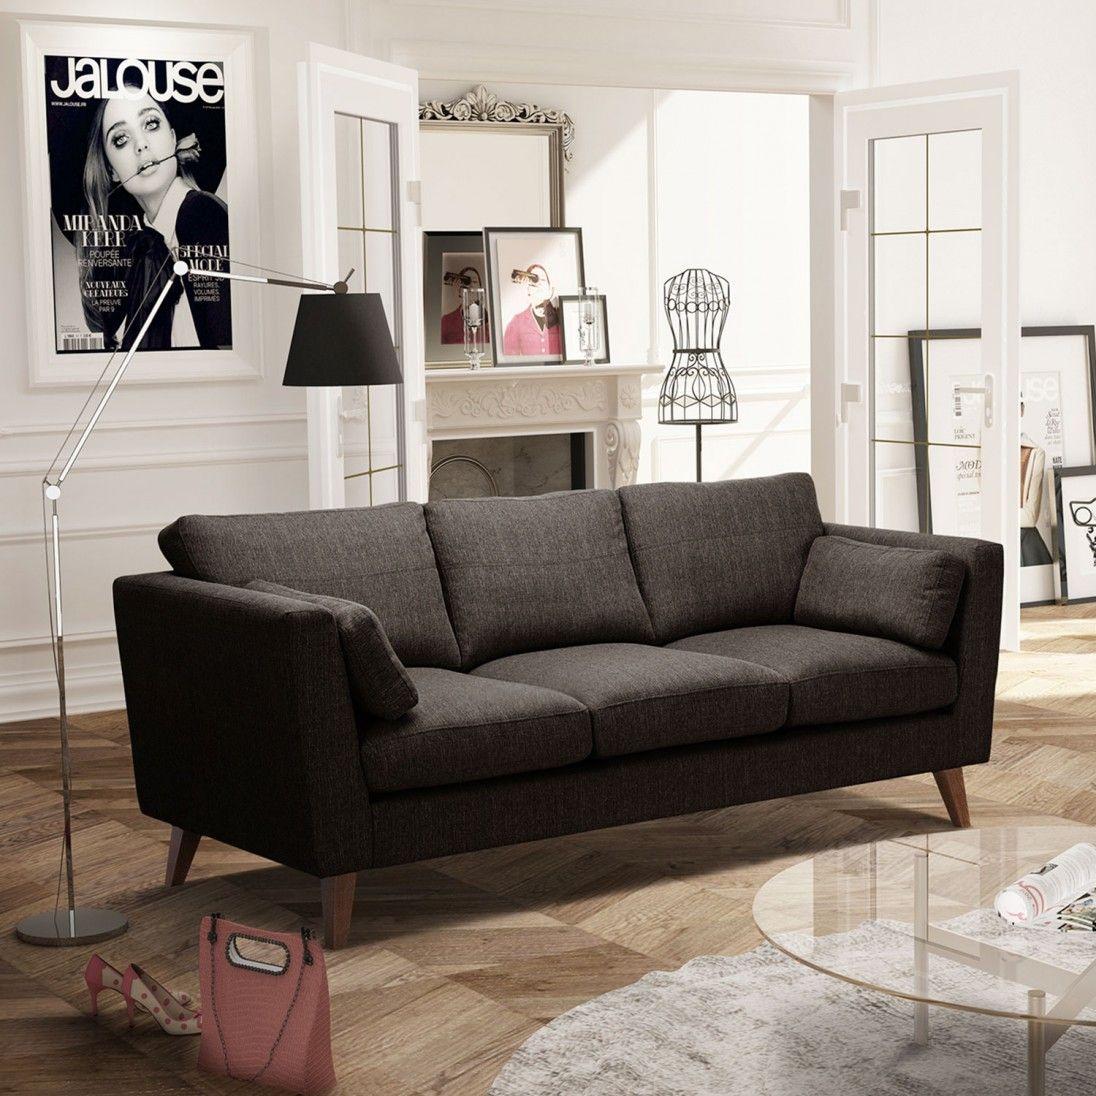 Elisa 3-Sitzer - Dunkelgrau Jalouse Maison | Interior Design ...